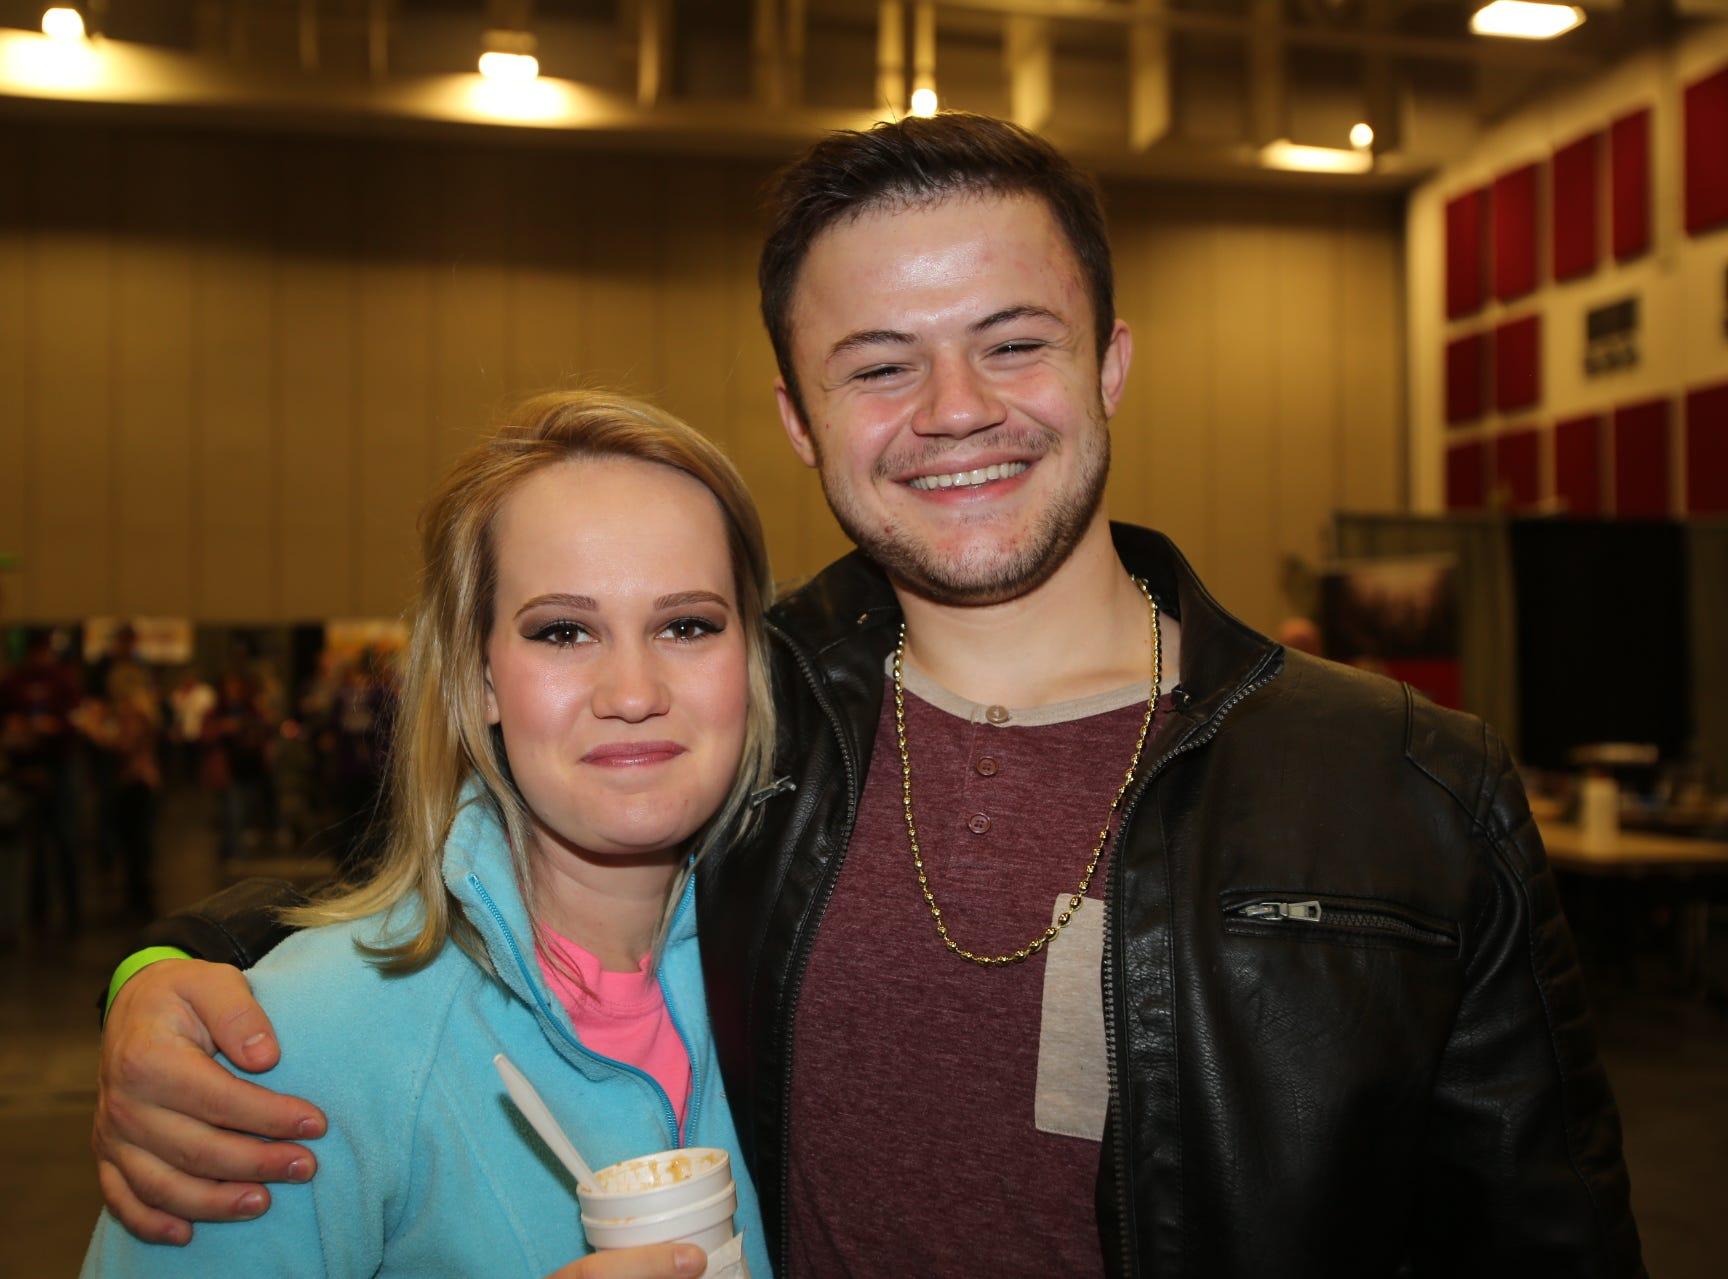 Hannah Sanders and Jacob Pessina